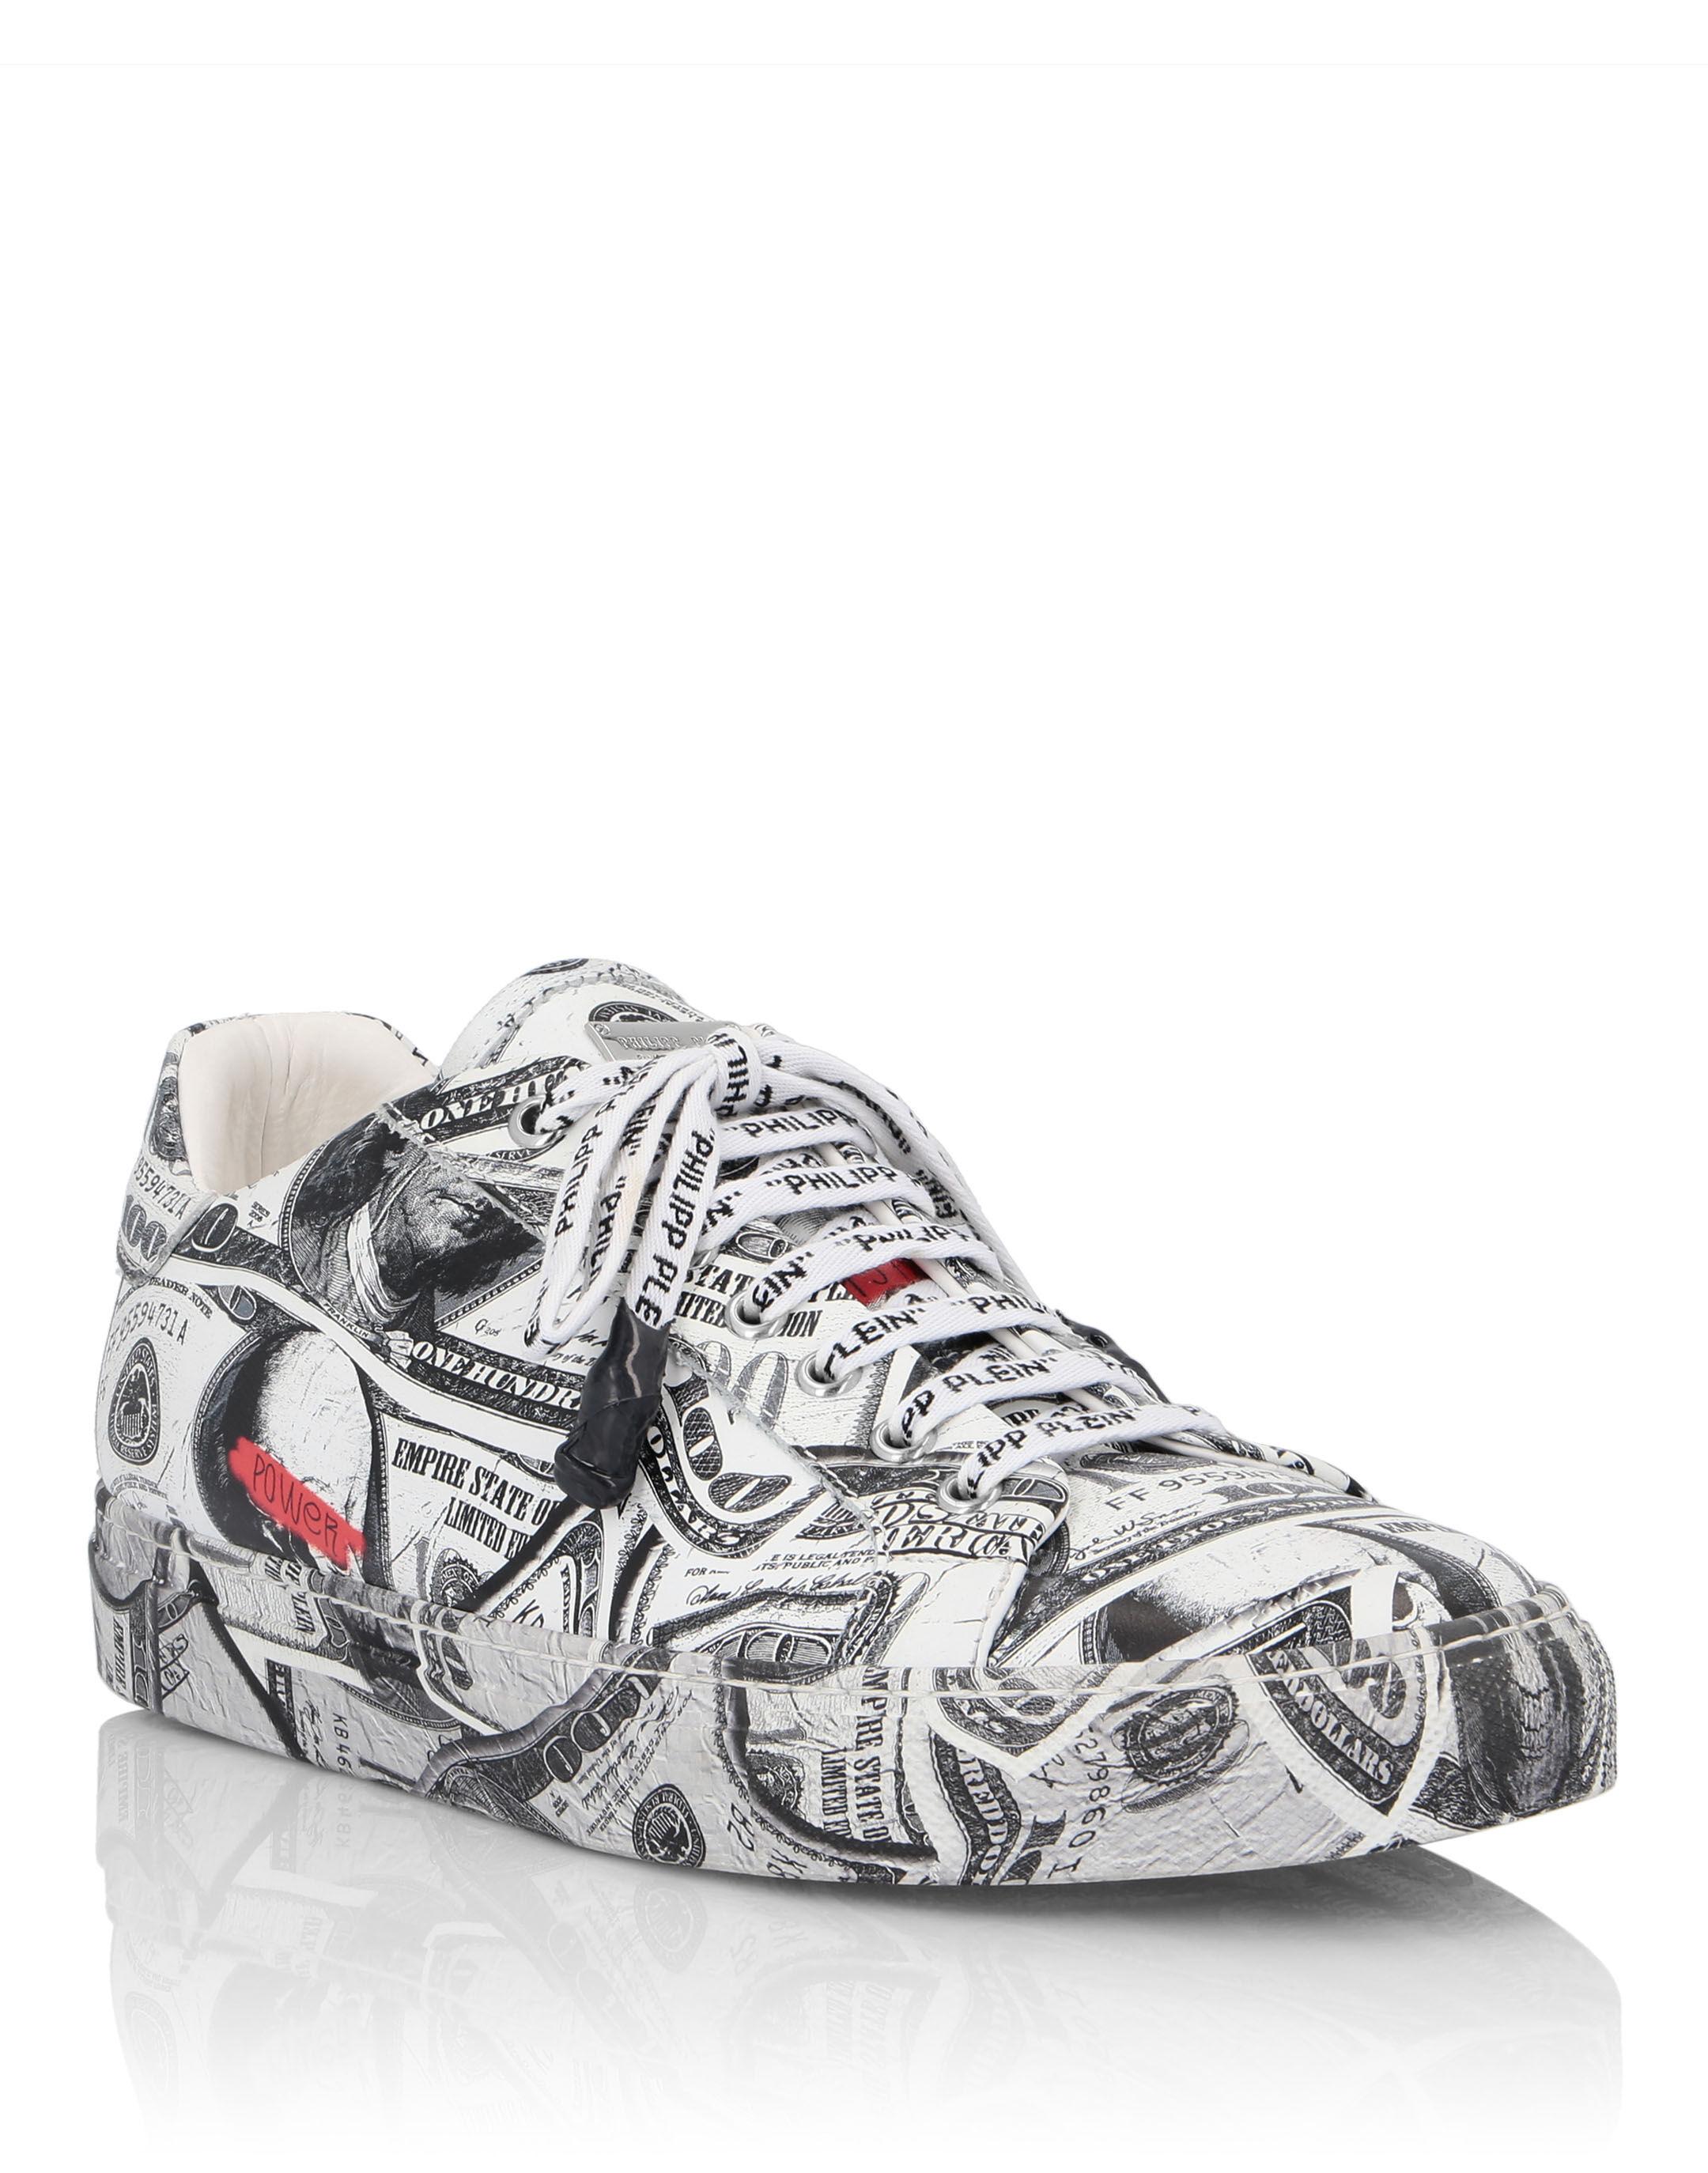 12fc199ebe33c Chaussures Philipp Homme Pour Chaussures Pour Philipp Plein Homme Plein  Chaussures wgESa